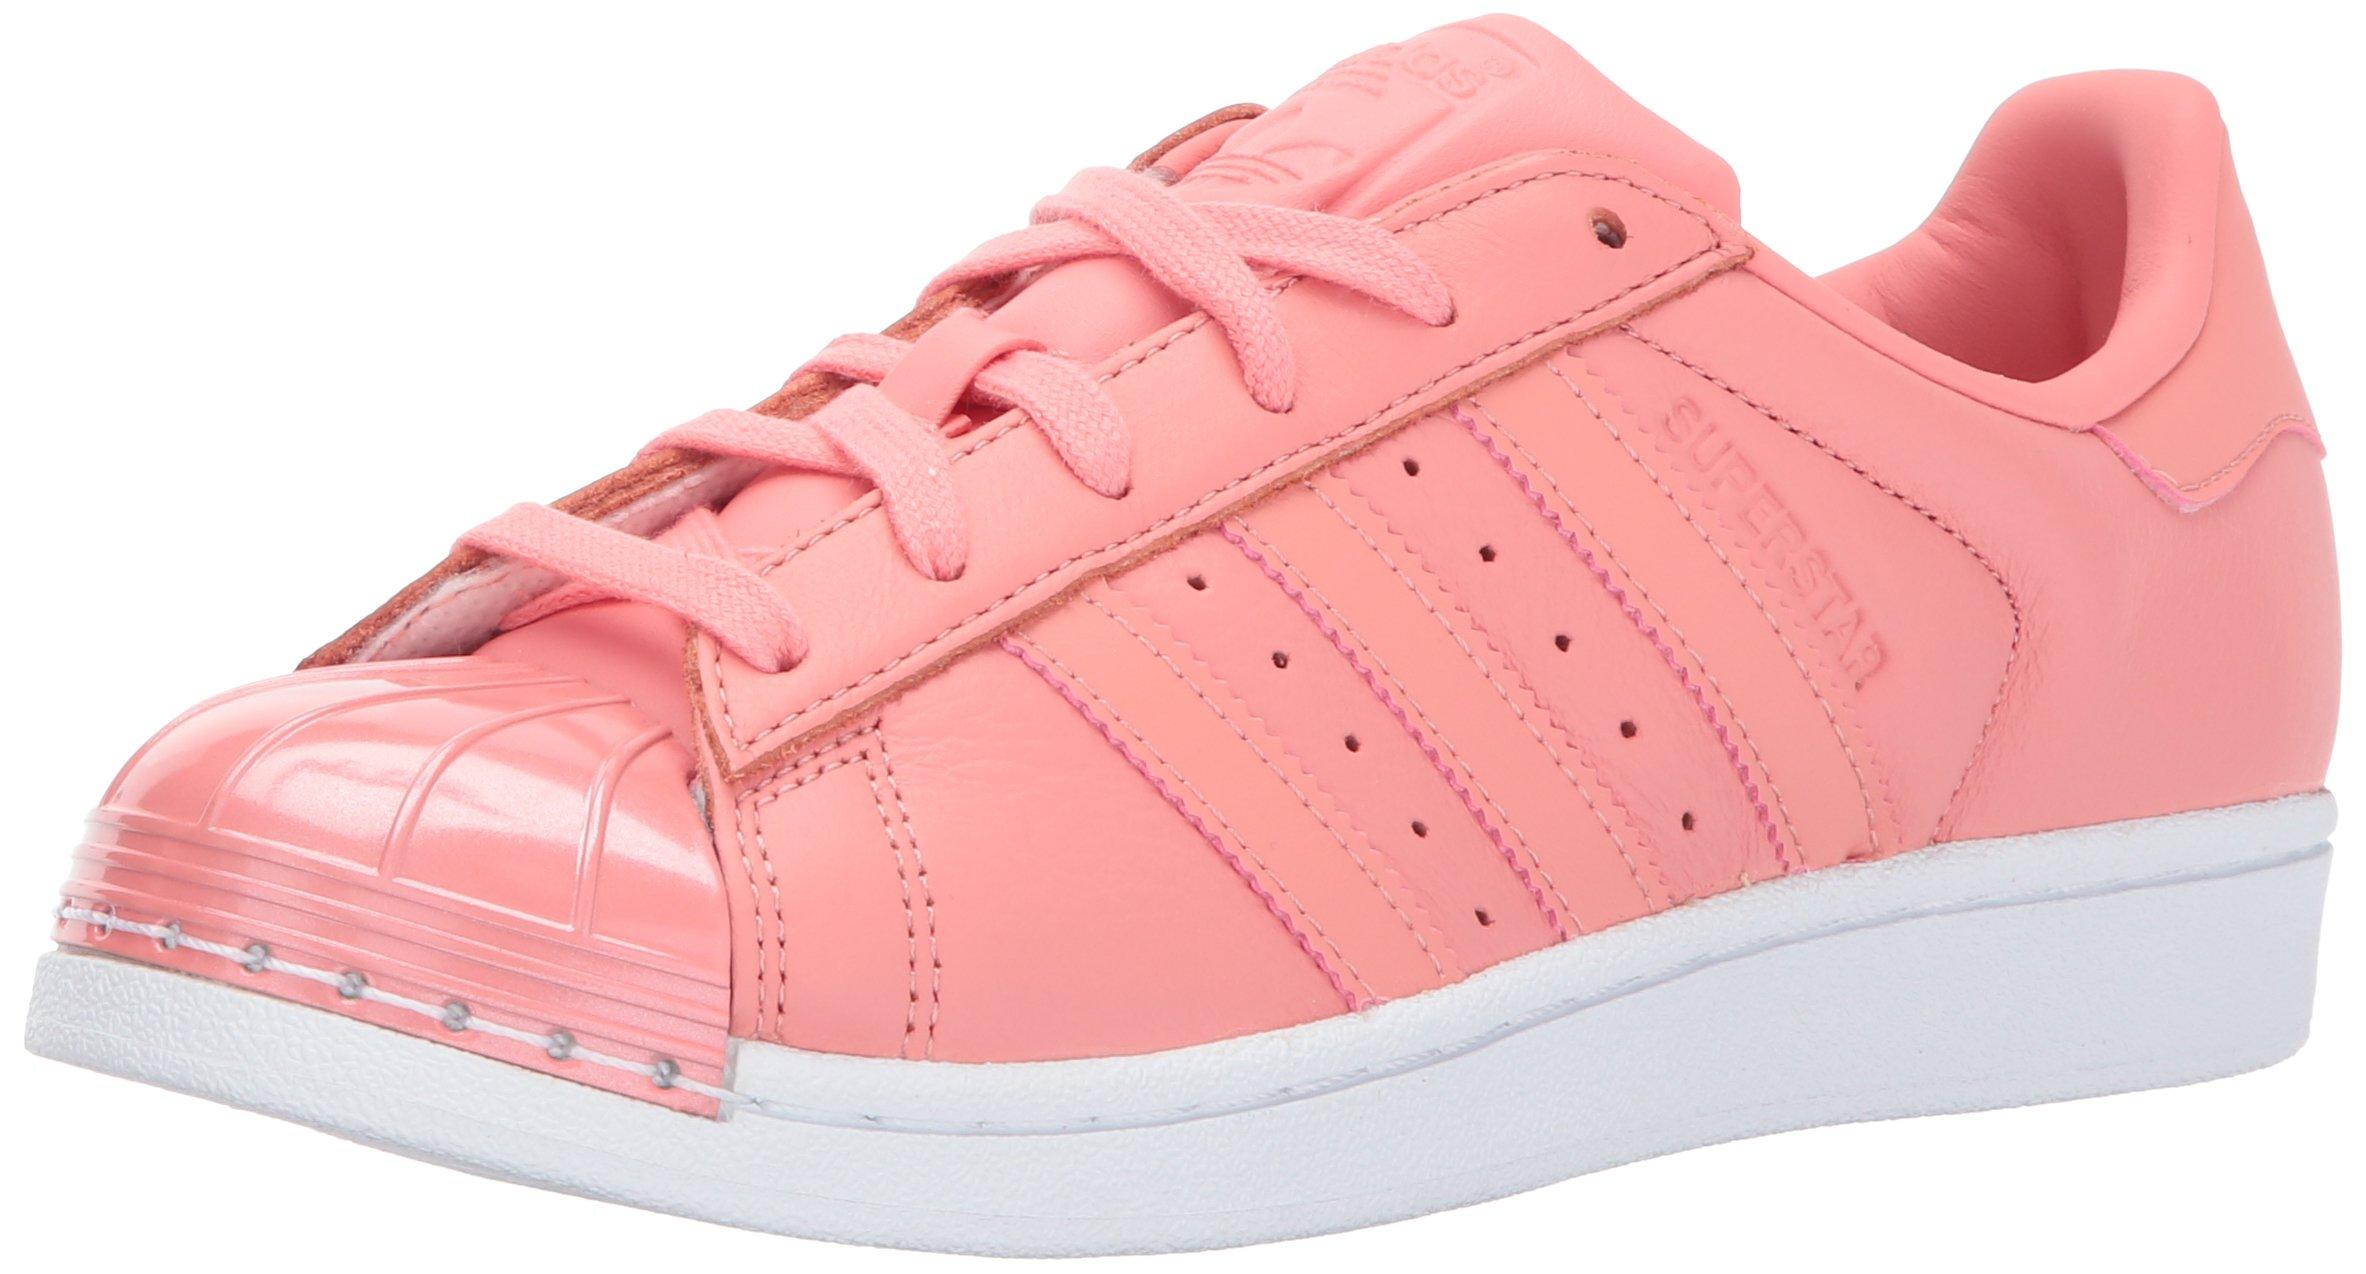 adidas Originals Women's Superstar Metal Toe W Skate Shoe, Tactile Rose/Tactile Rose/White, 9 Medium US